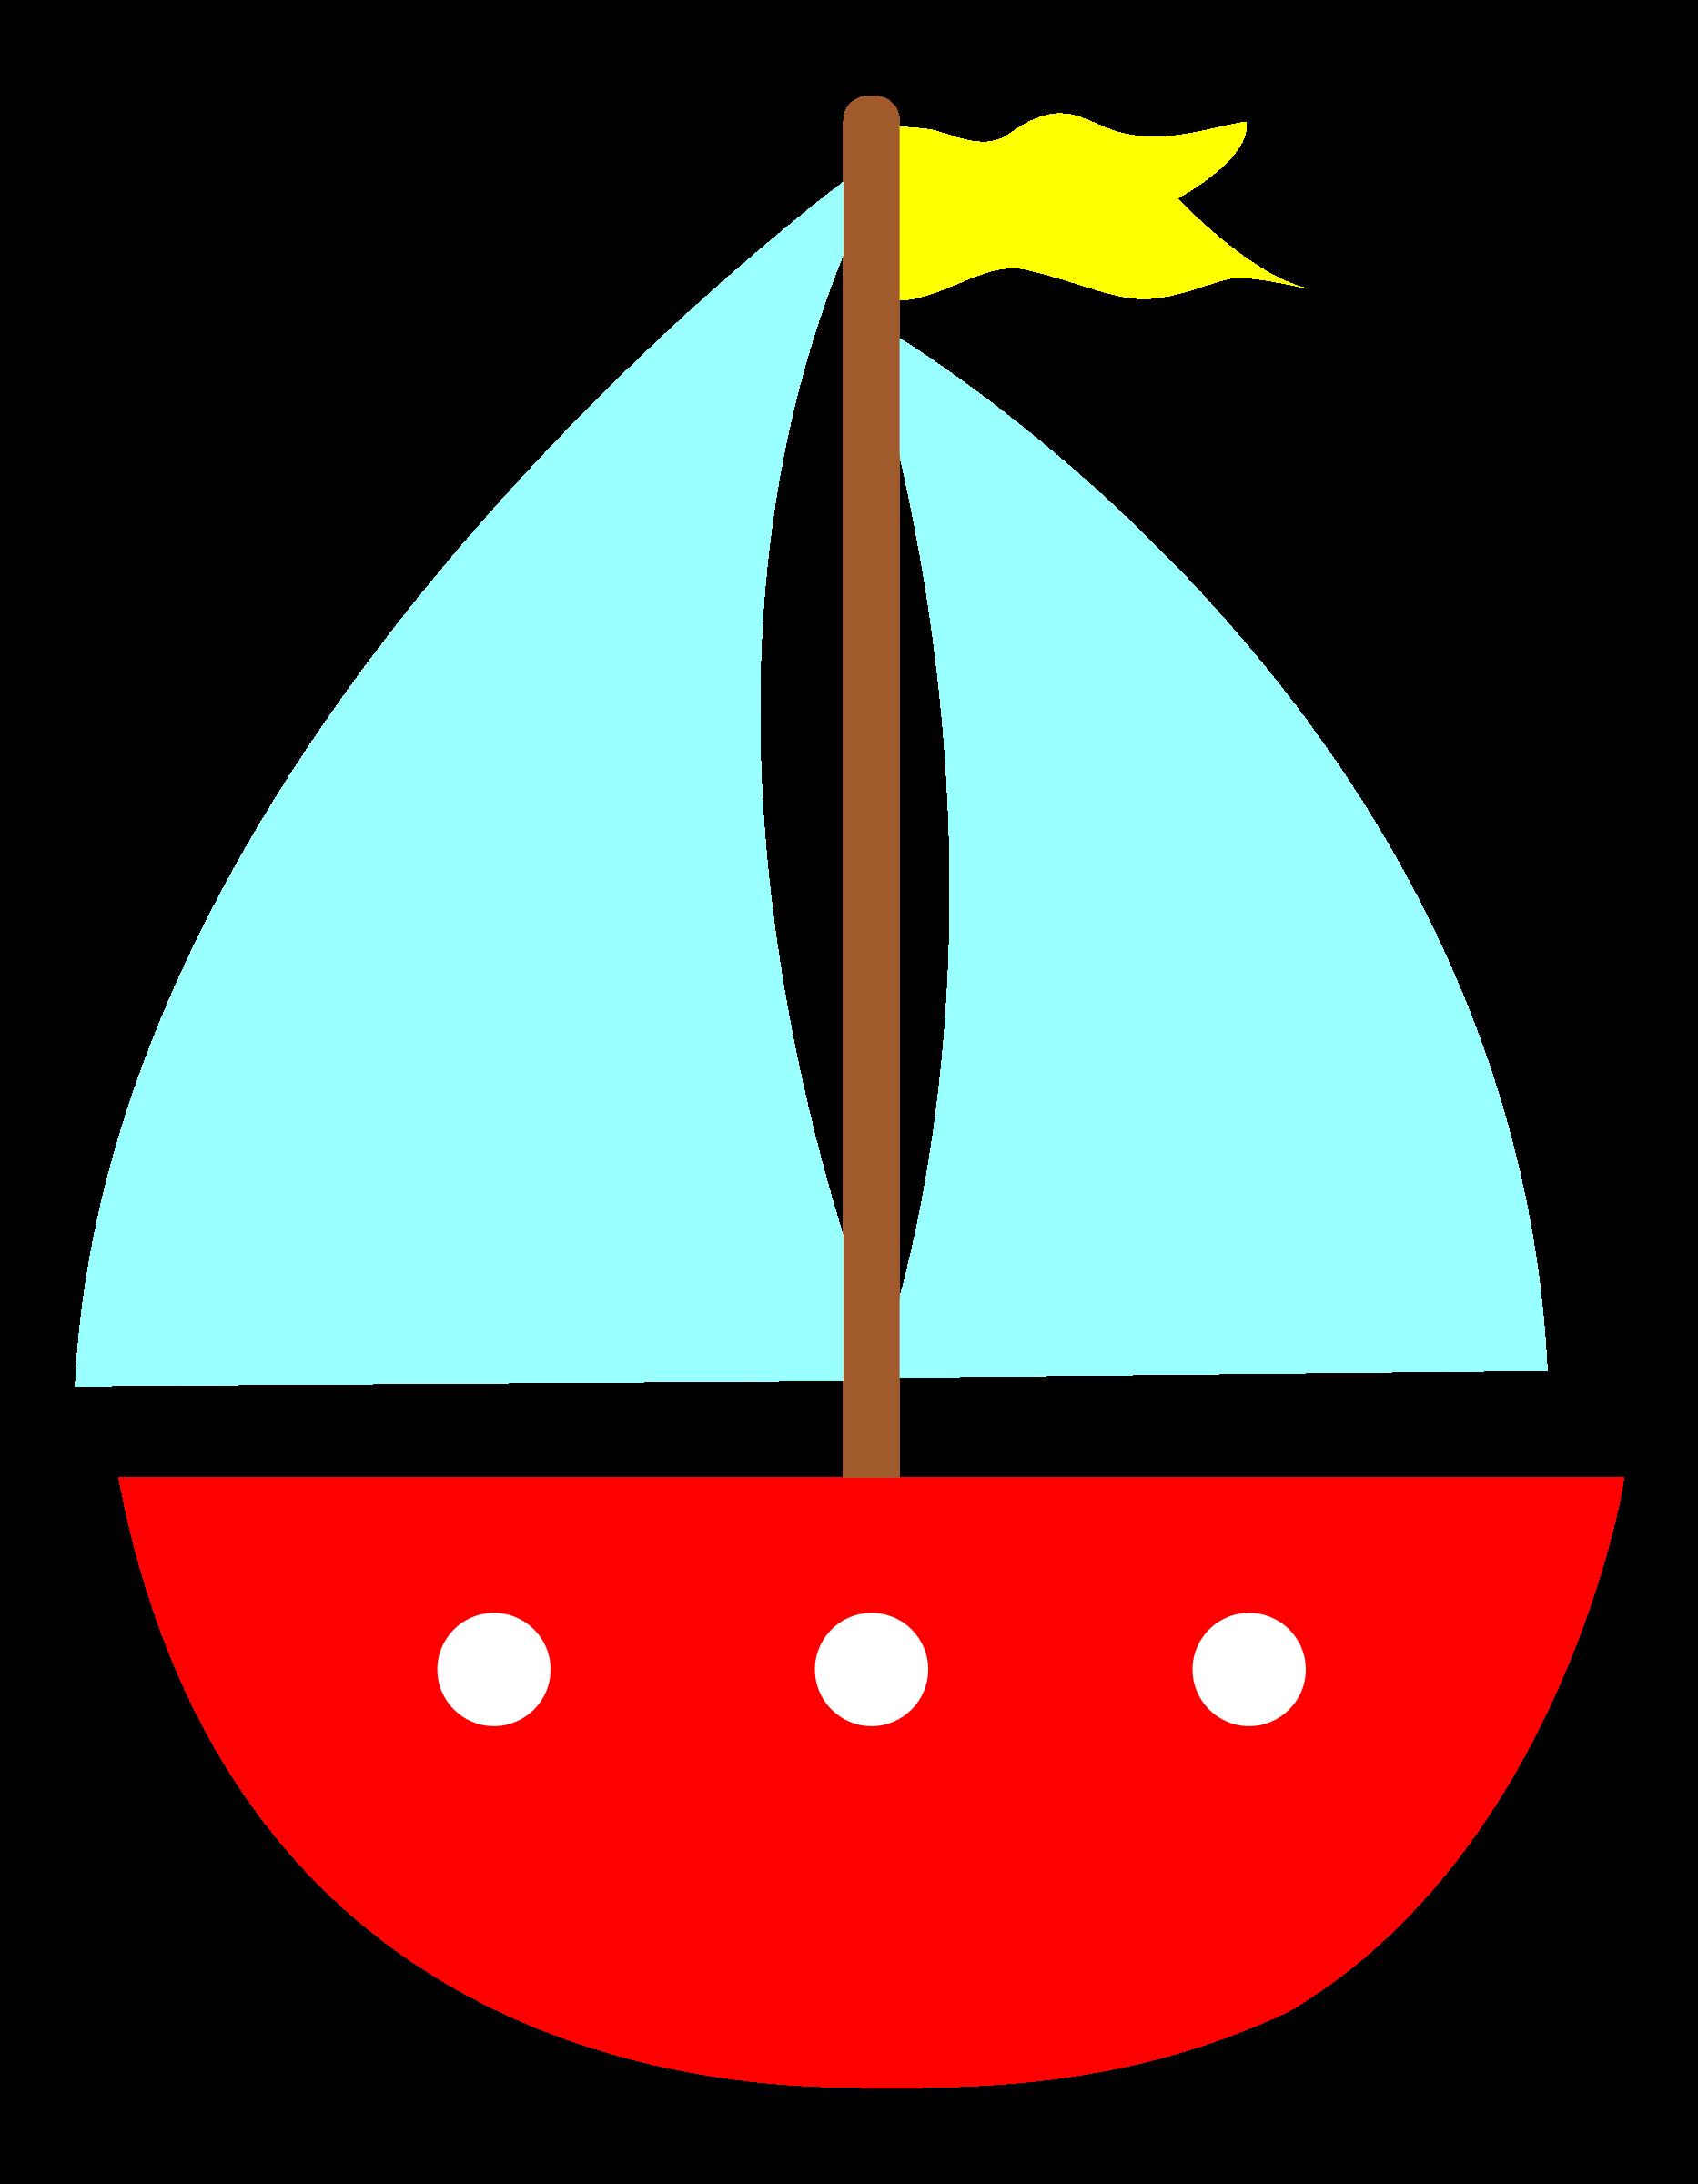 1866x2400 Clip Art Sailboat Silhouette Clip Art